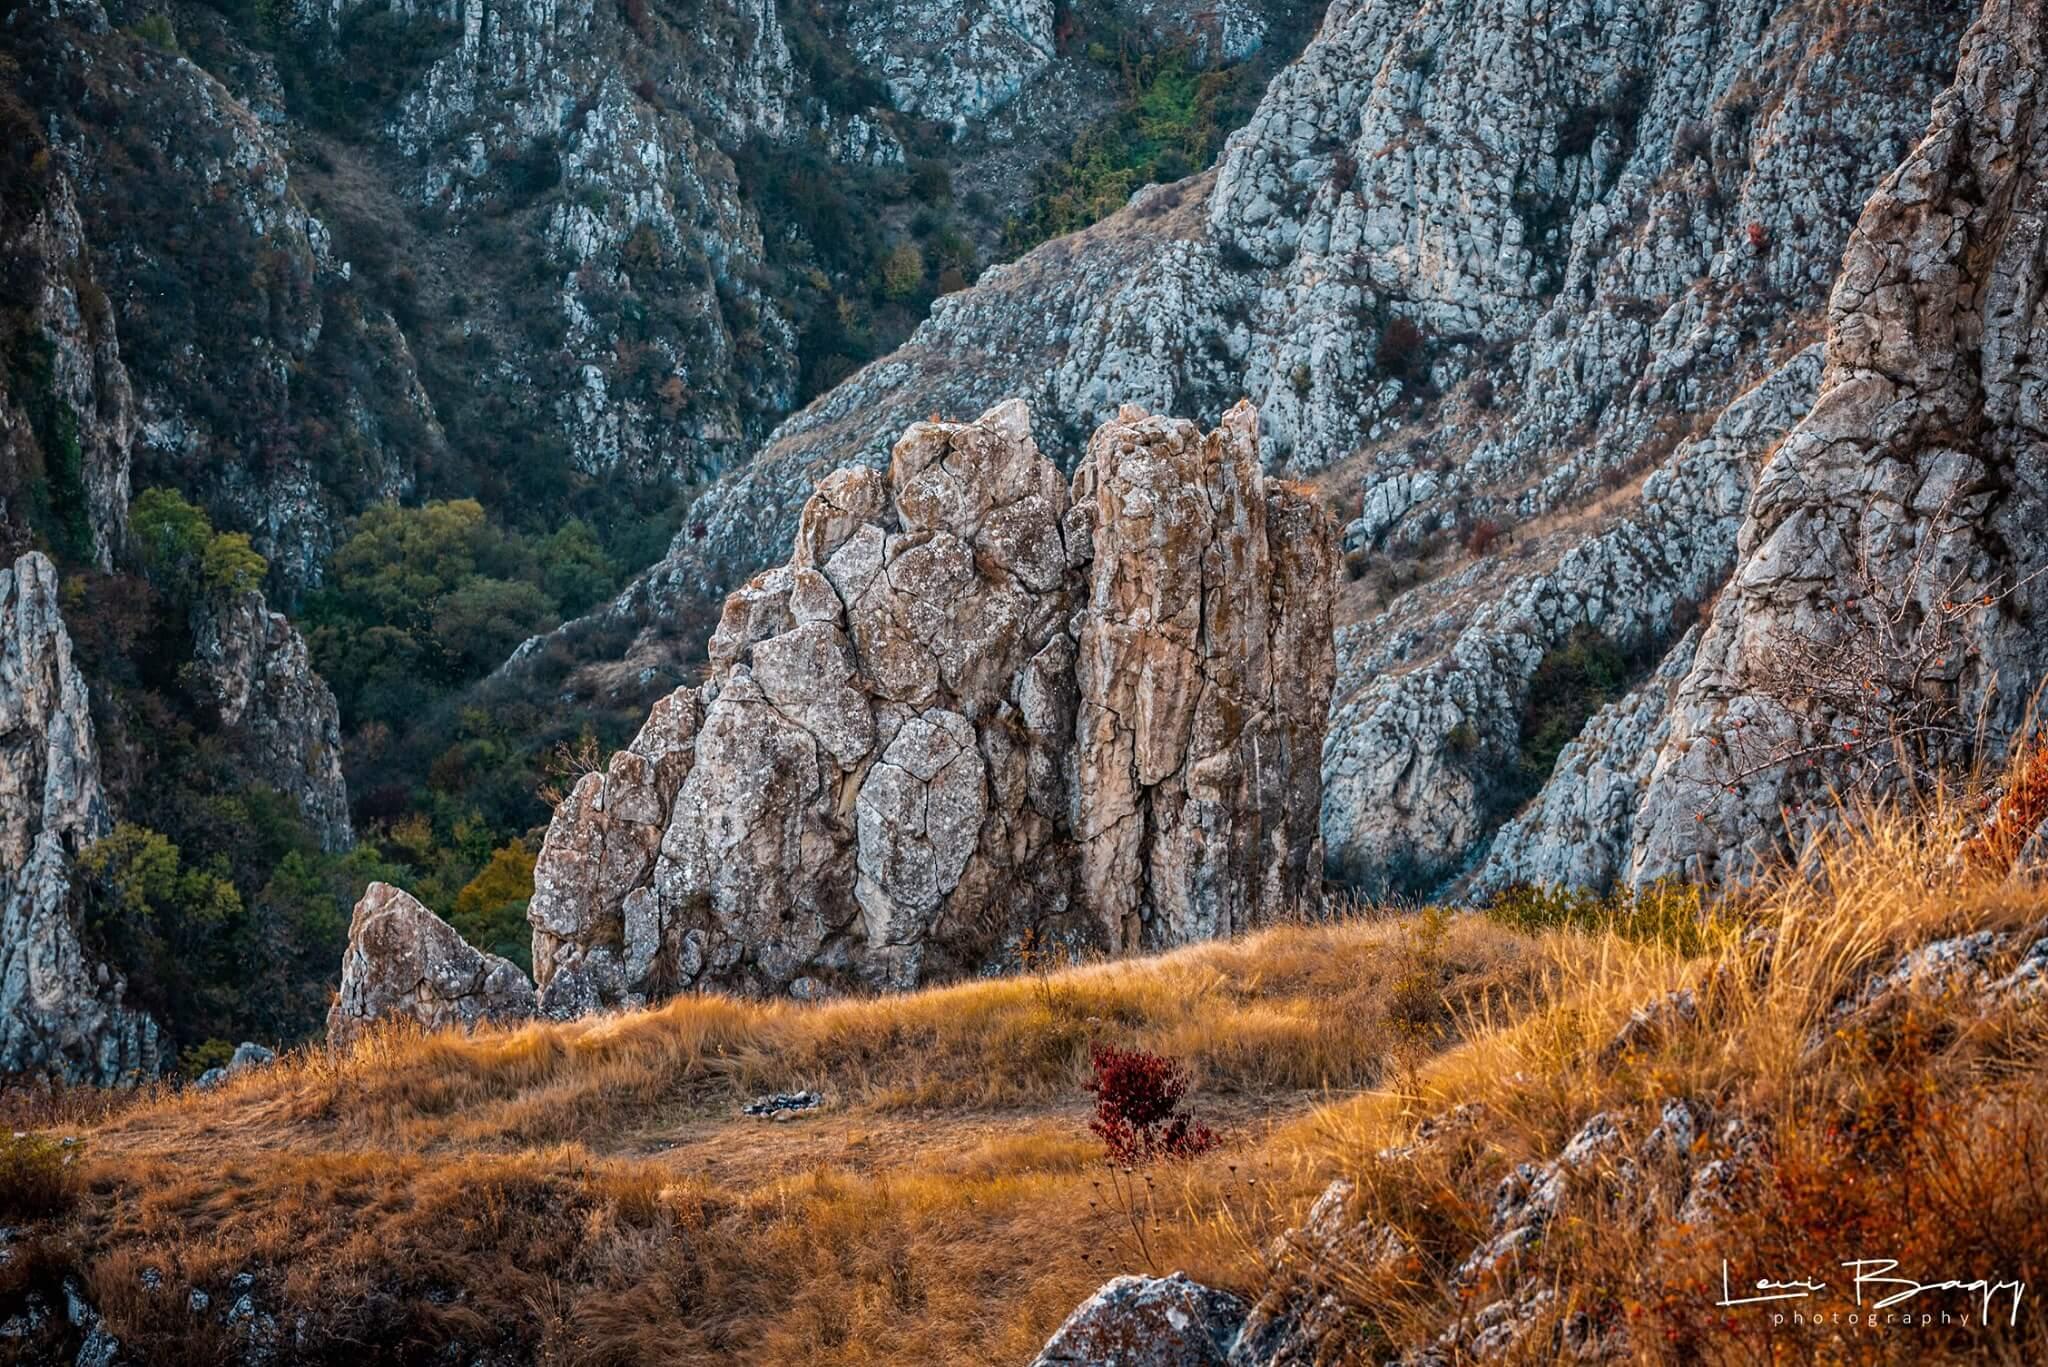 Cheile Turului (Tureni) - Levi Bagy Photography